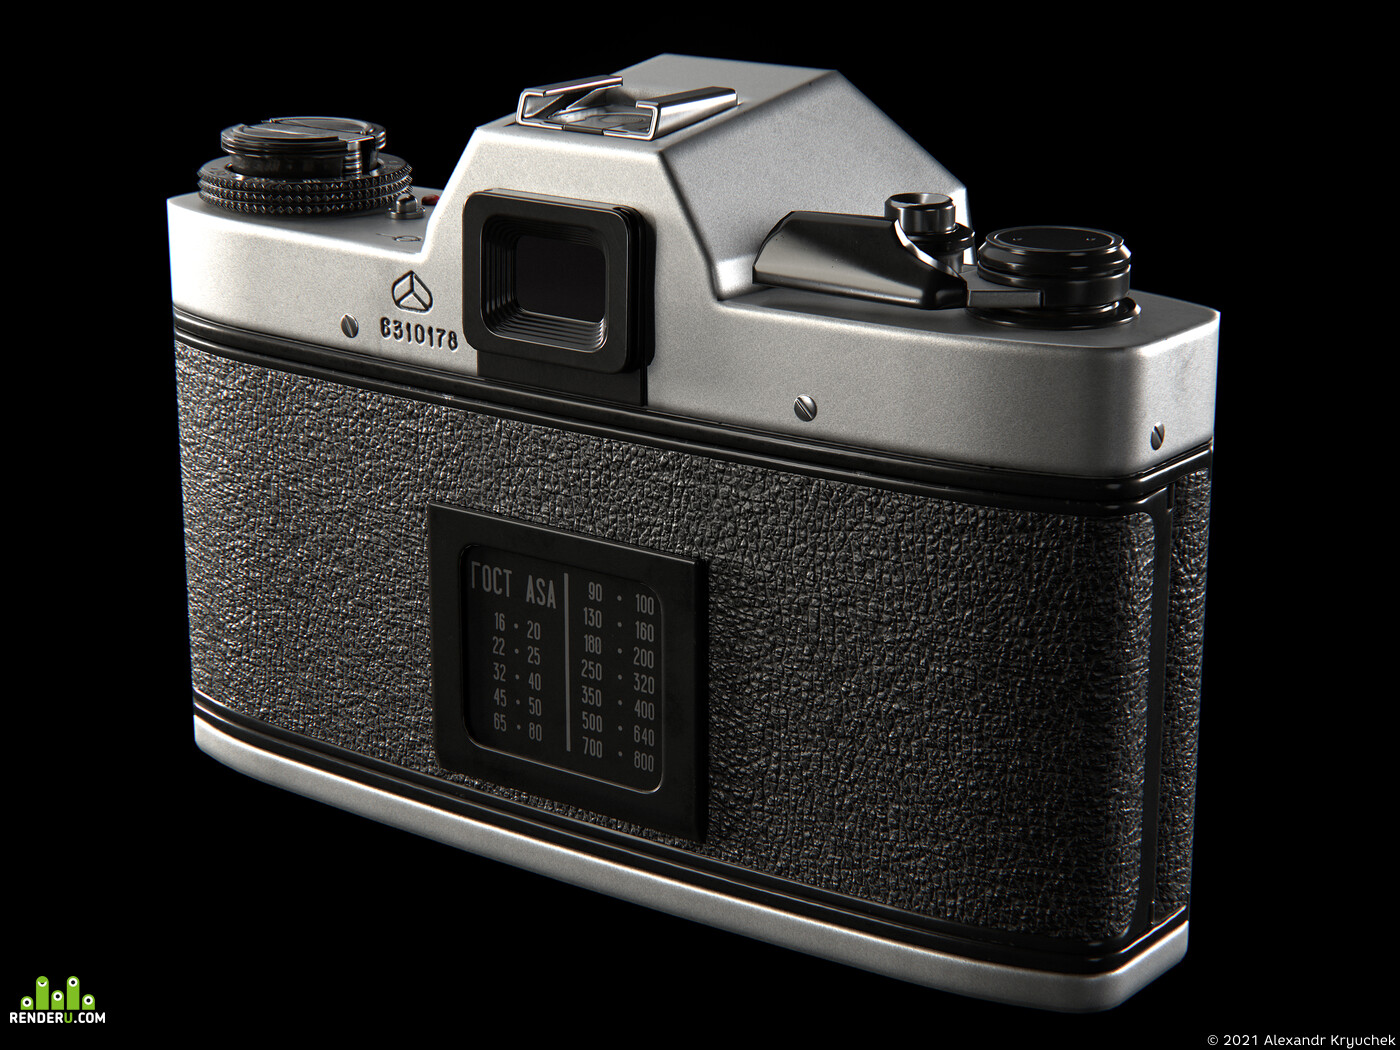 фотокамера, Камера, объектив, Советский, Фотоаппарат